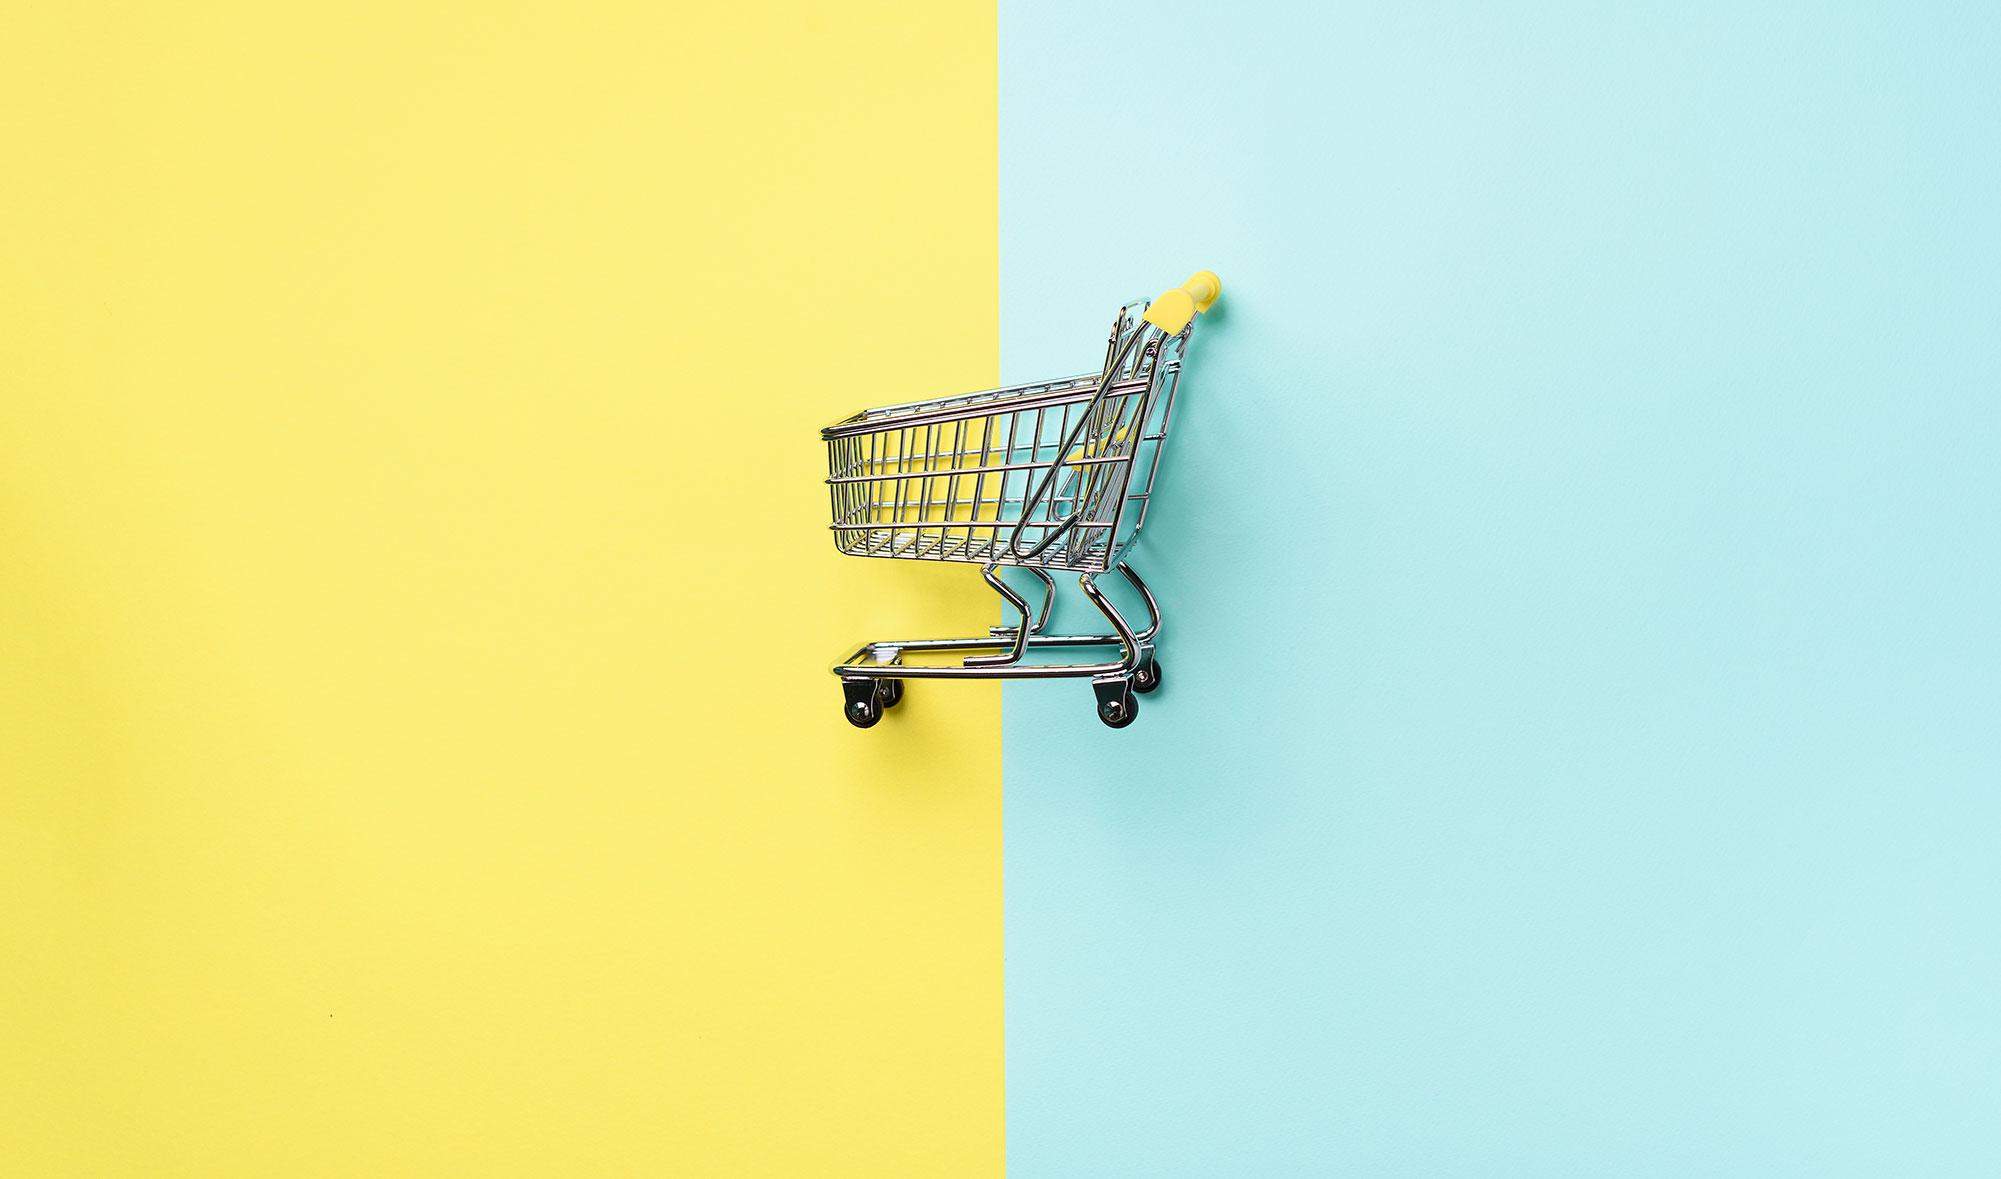 shopping-cart-on-blue-and-yellow-background-minima-ARBKQCB.jpg